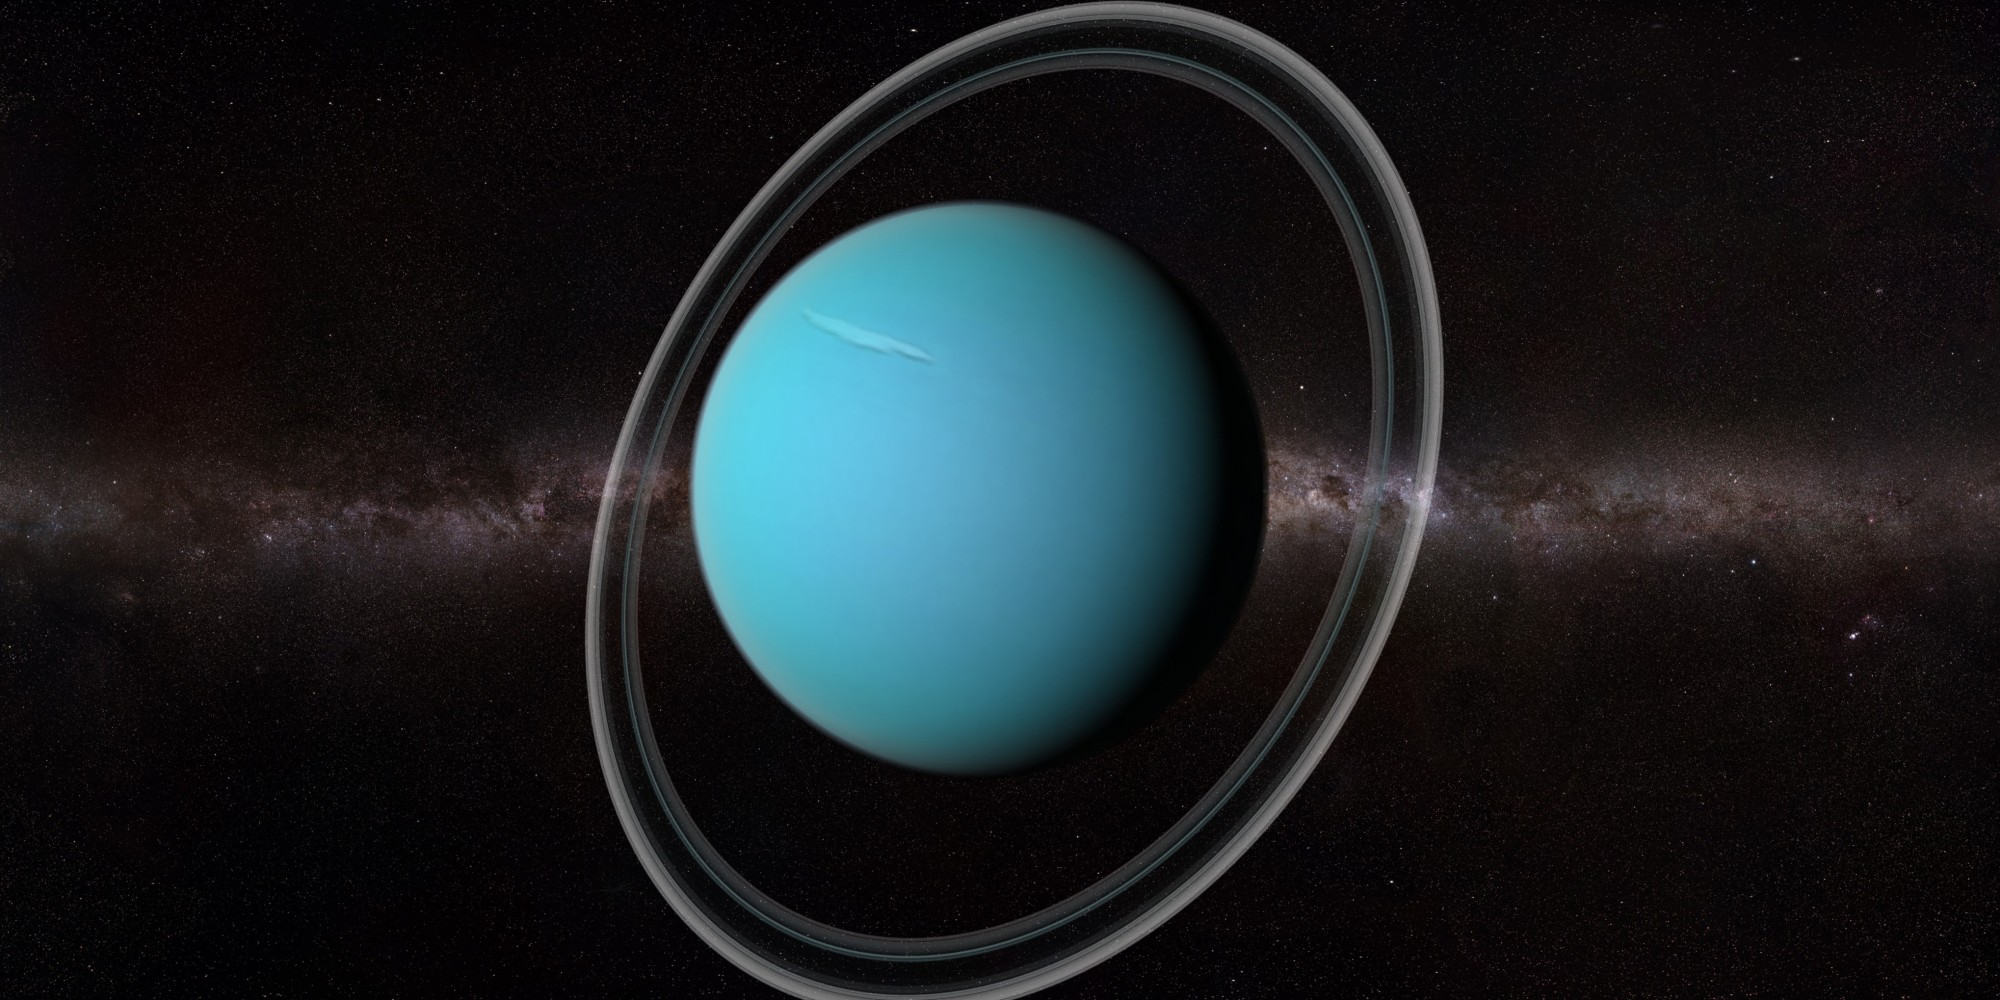 3d Solar System Live Wallpaper For Android Sistemul Solar Planeta Uranus AnideȘcoală Ro